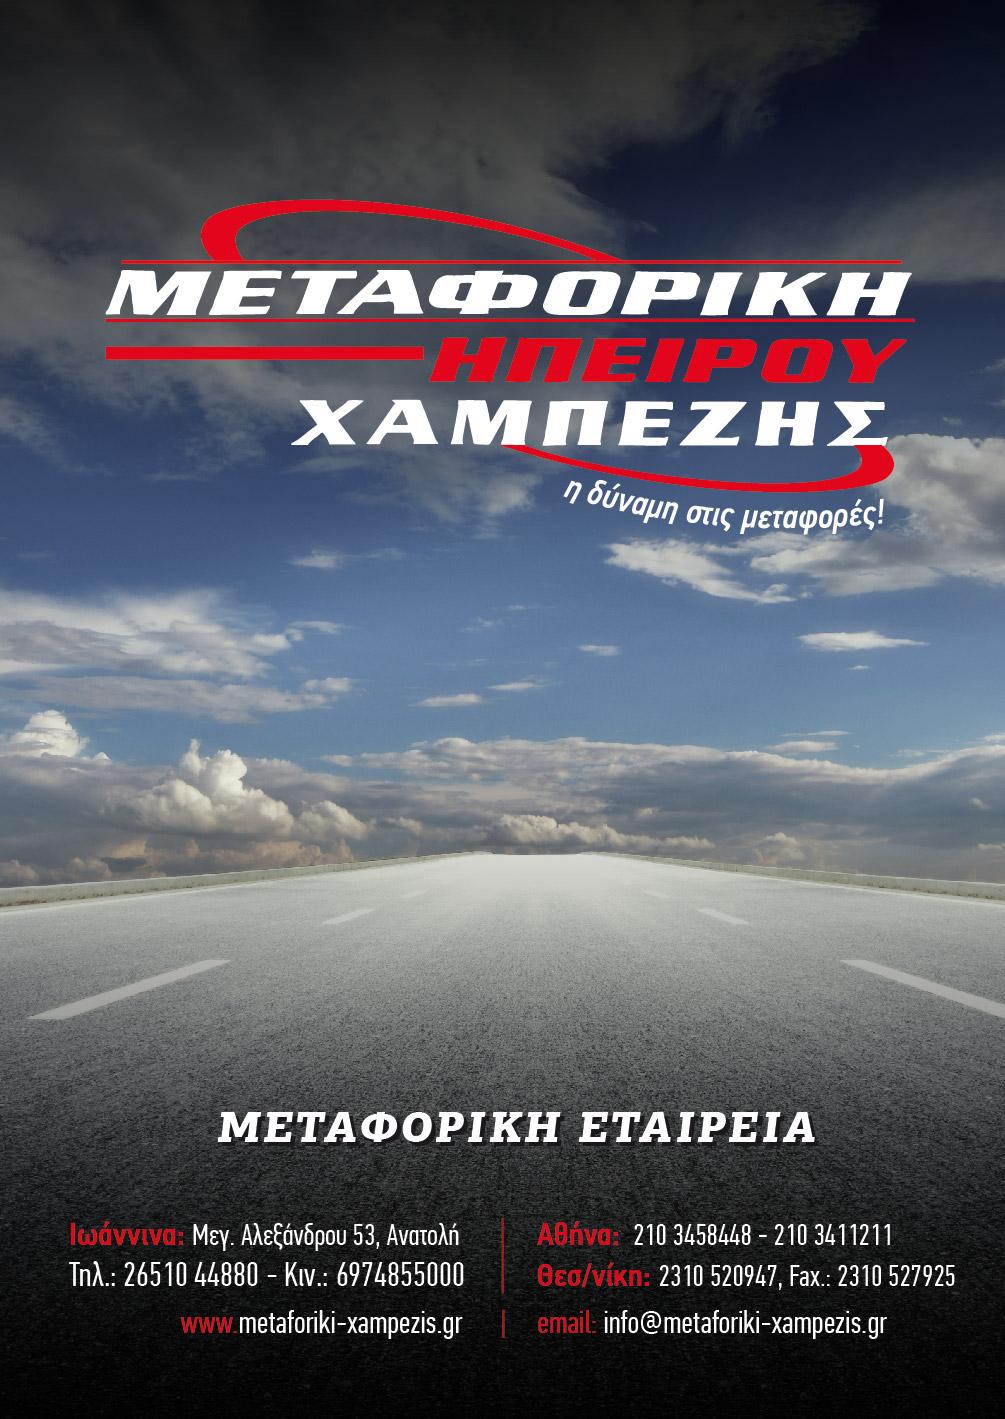 HAMPEZHS-cover-05